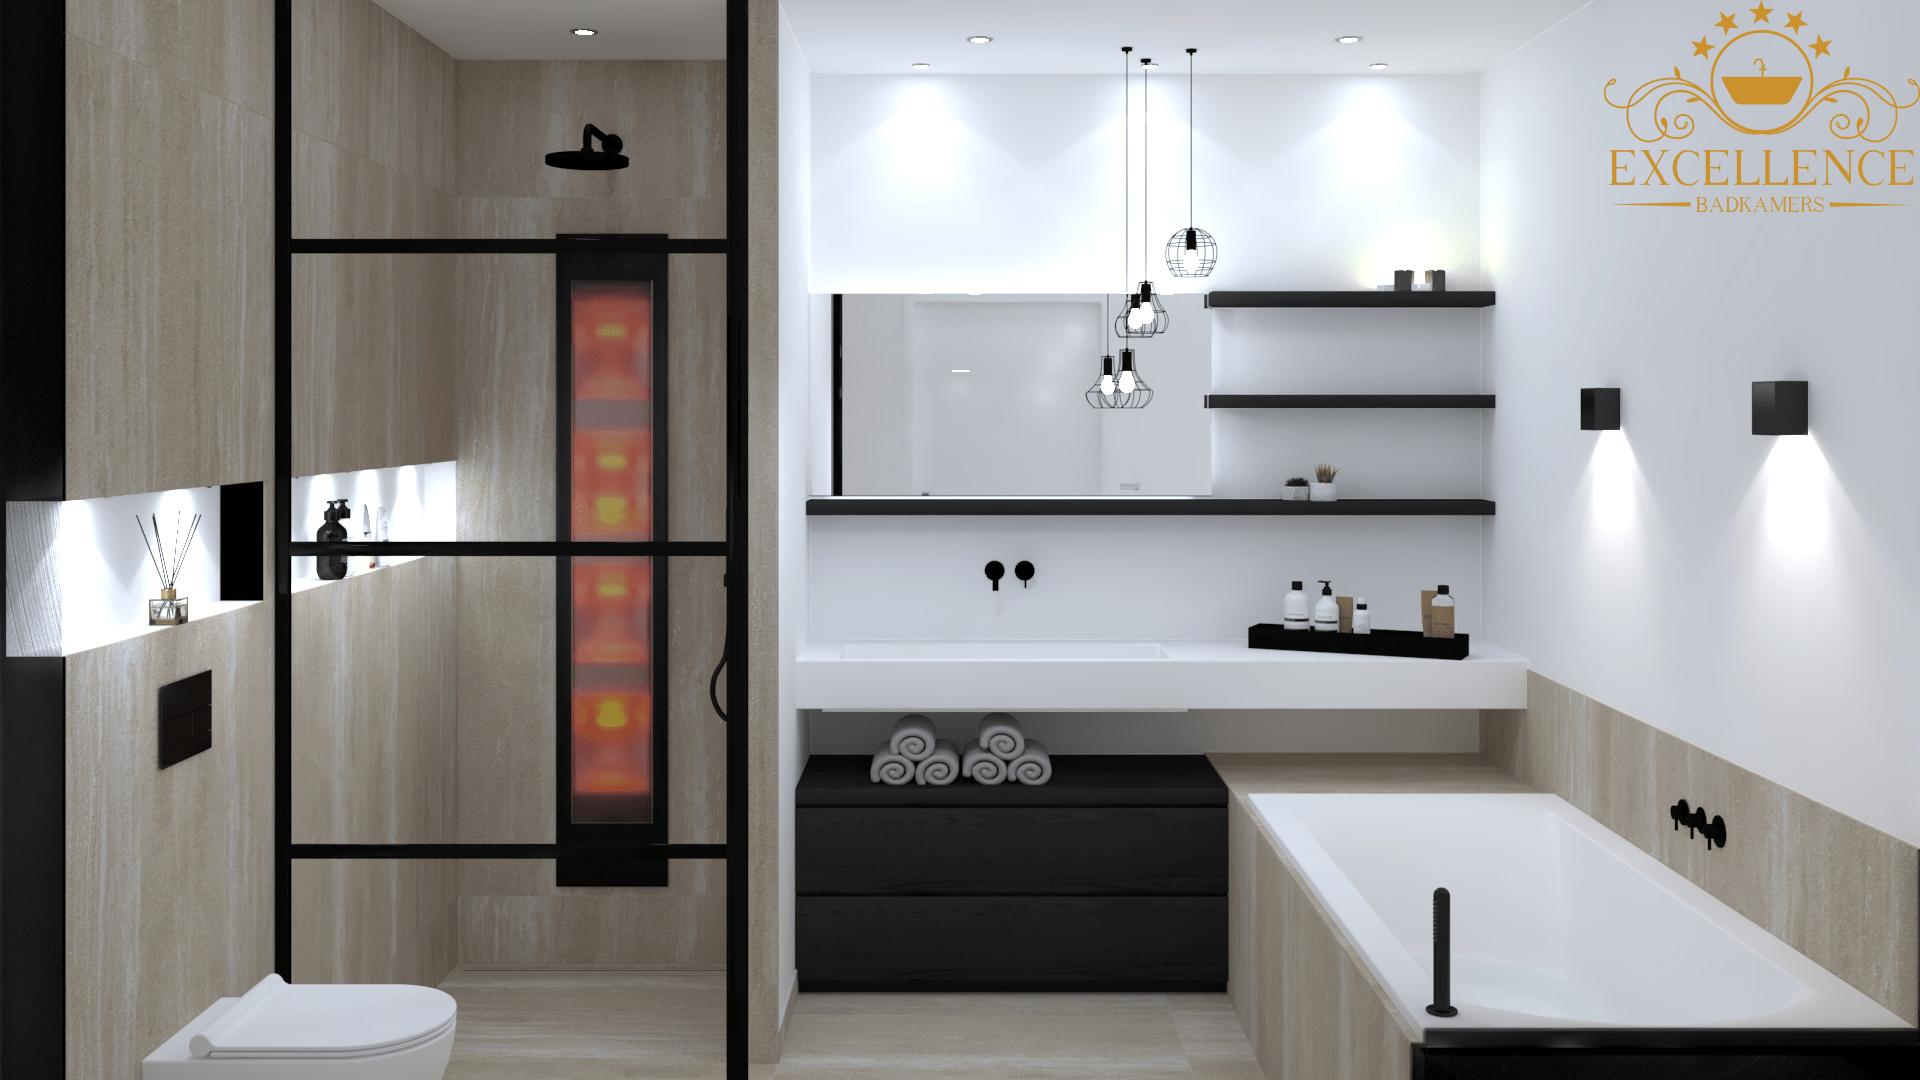 travertin badkamer